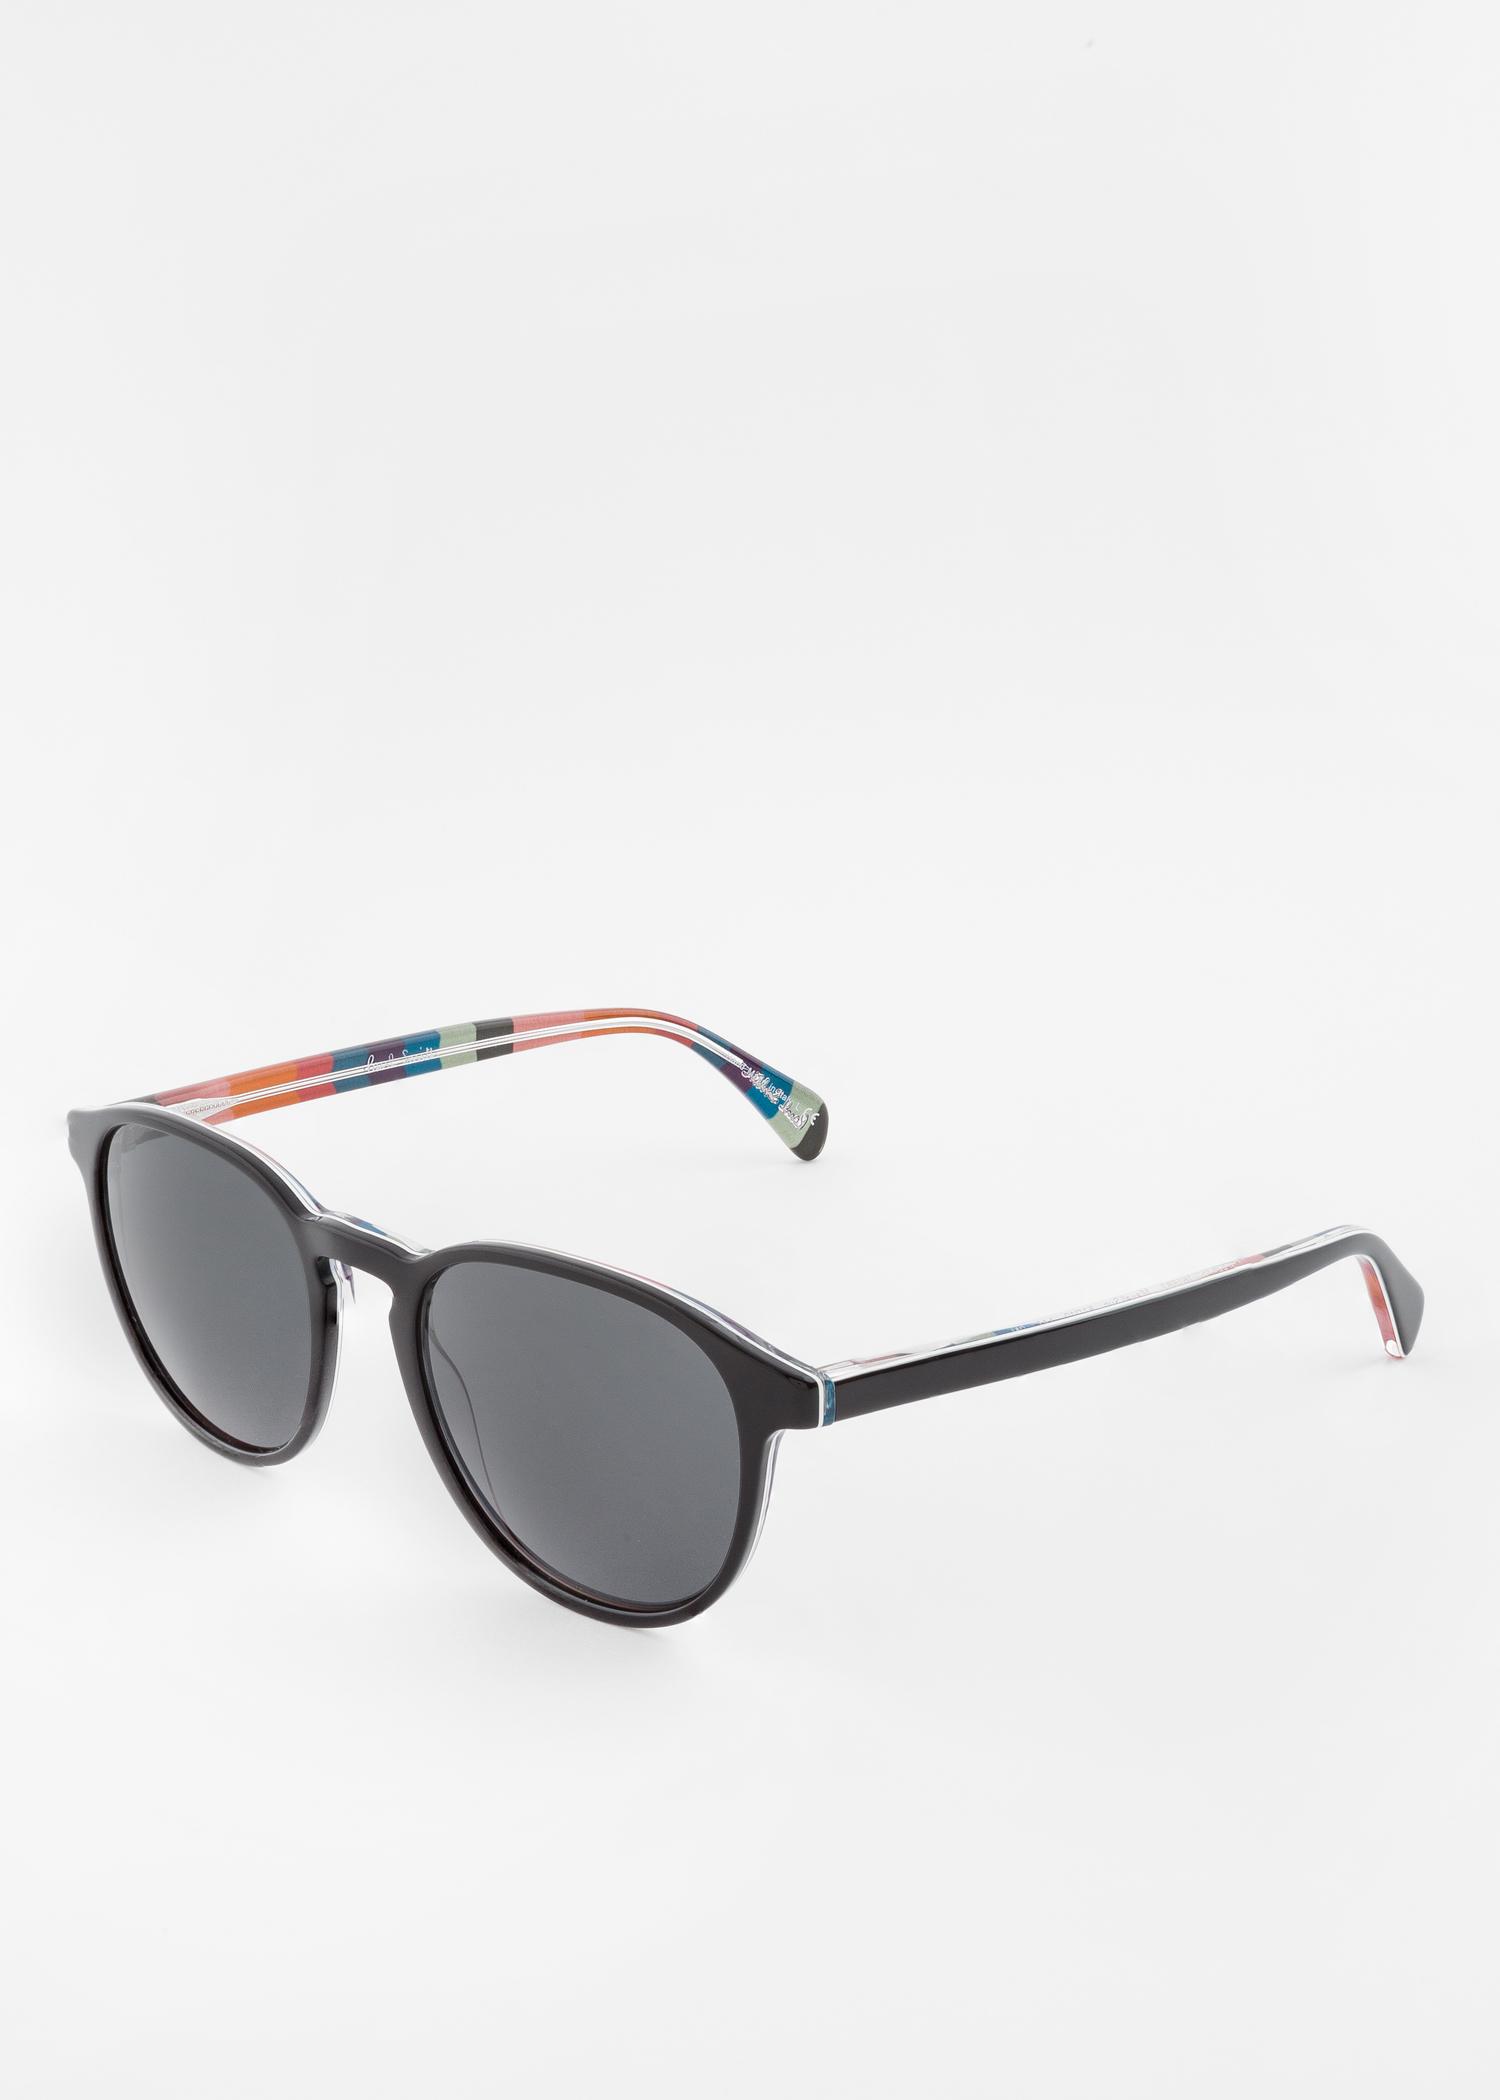 bab6608a2b5aa Paul Smith Onyx And Artist Stripe  Mayall  Sunglasses - Paul Smith